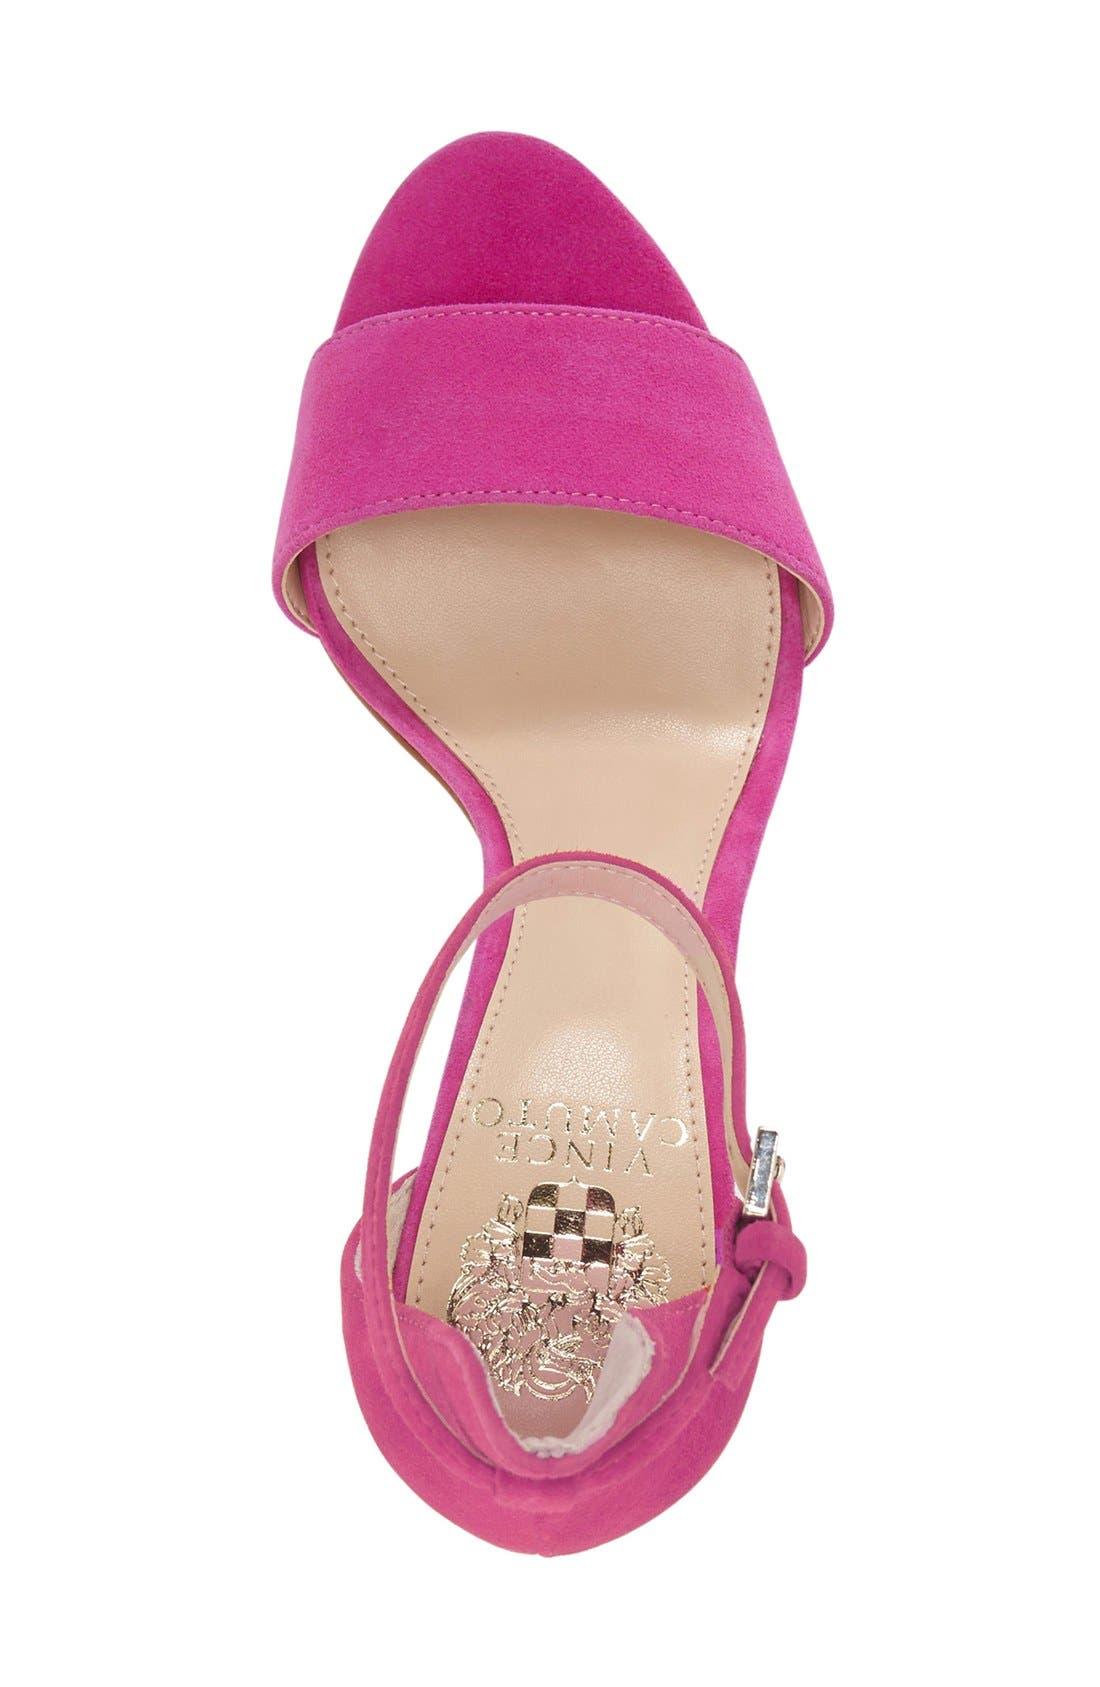 ,                             'Court' Ankle Strap Sandal,                             Alternate thumbnail 98, color,                             661